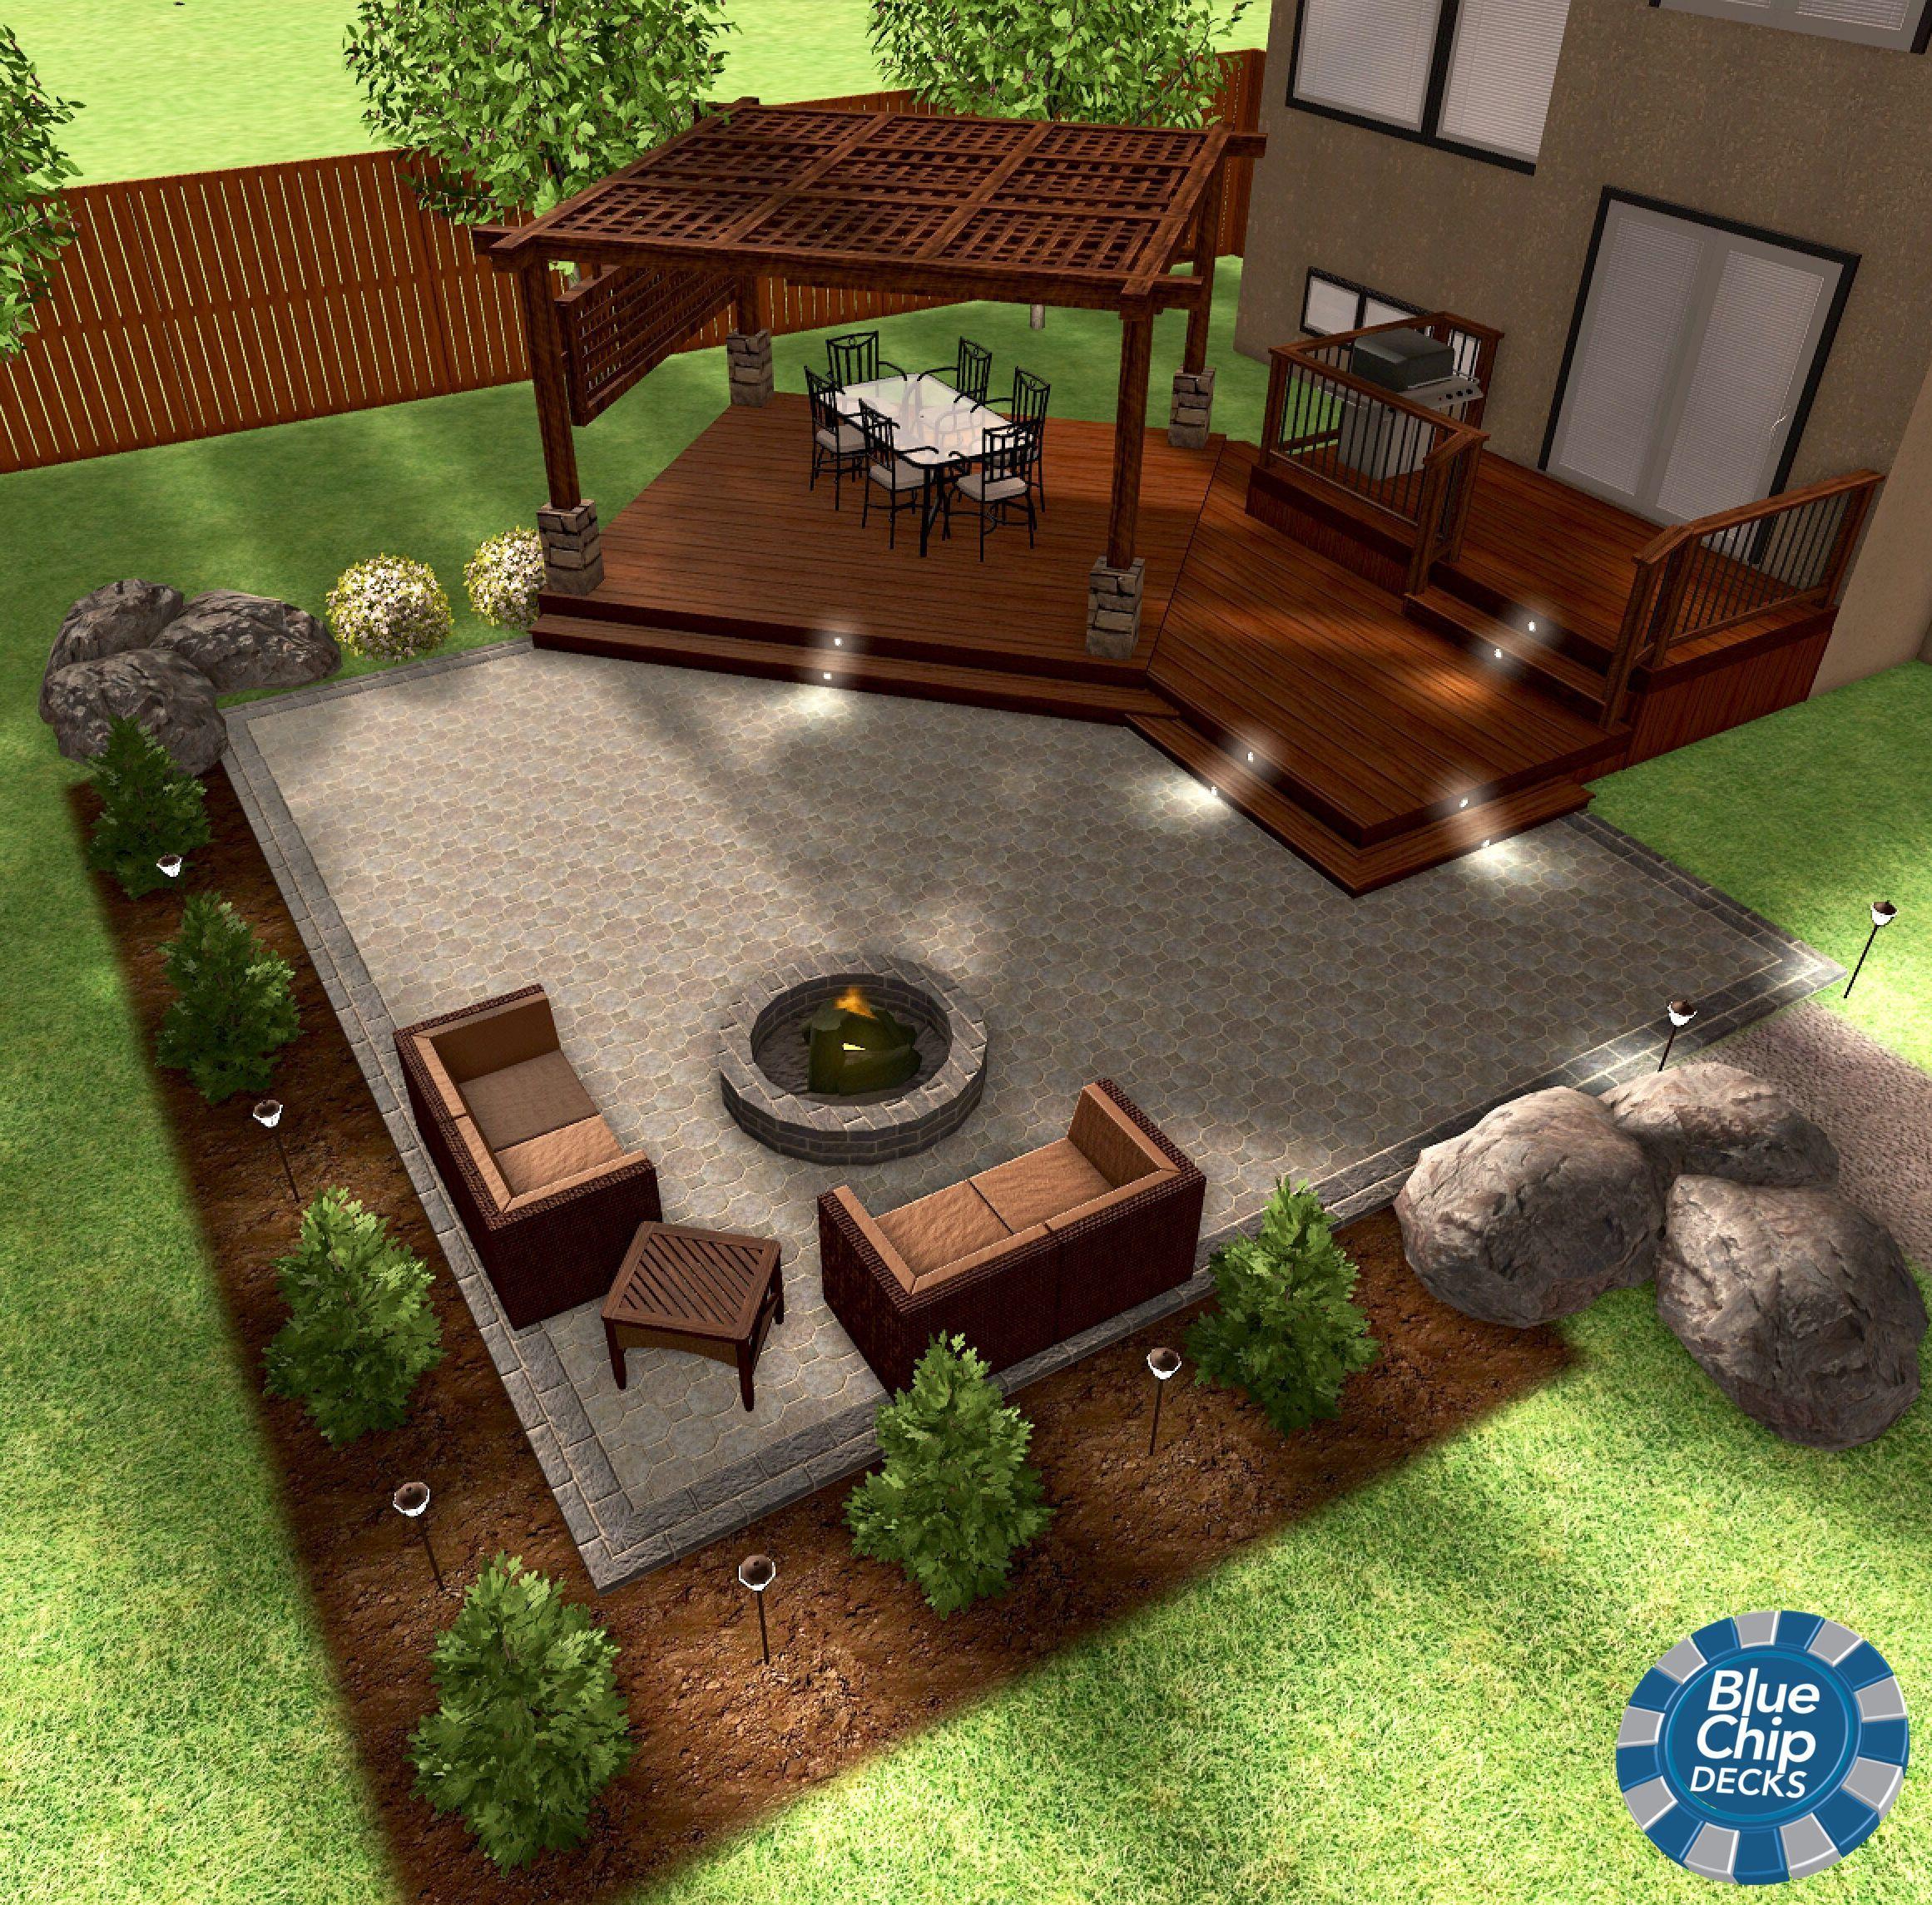 Prettyphotography Backyard Entertaining Space Backyard Entertaining Backyard Garden Design